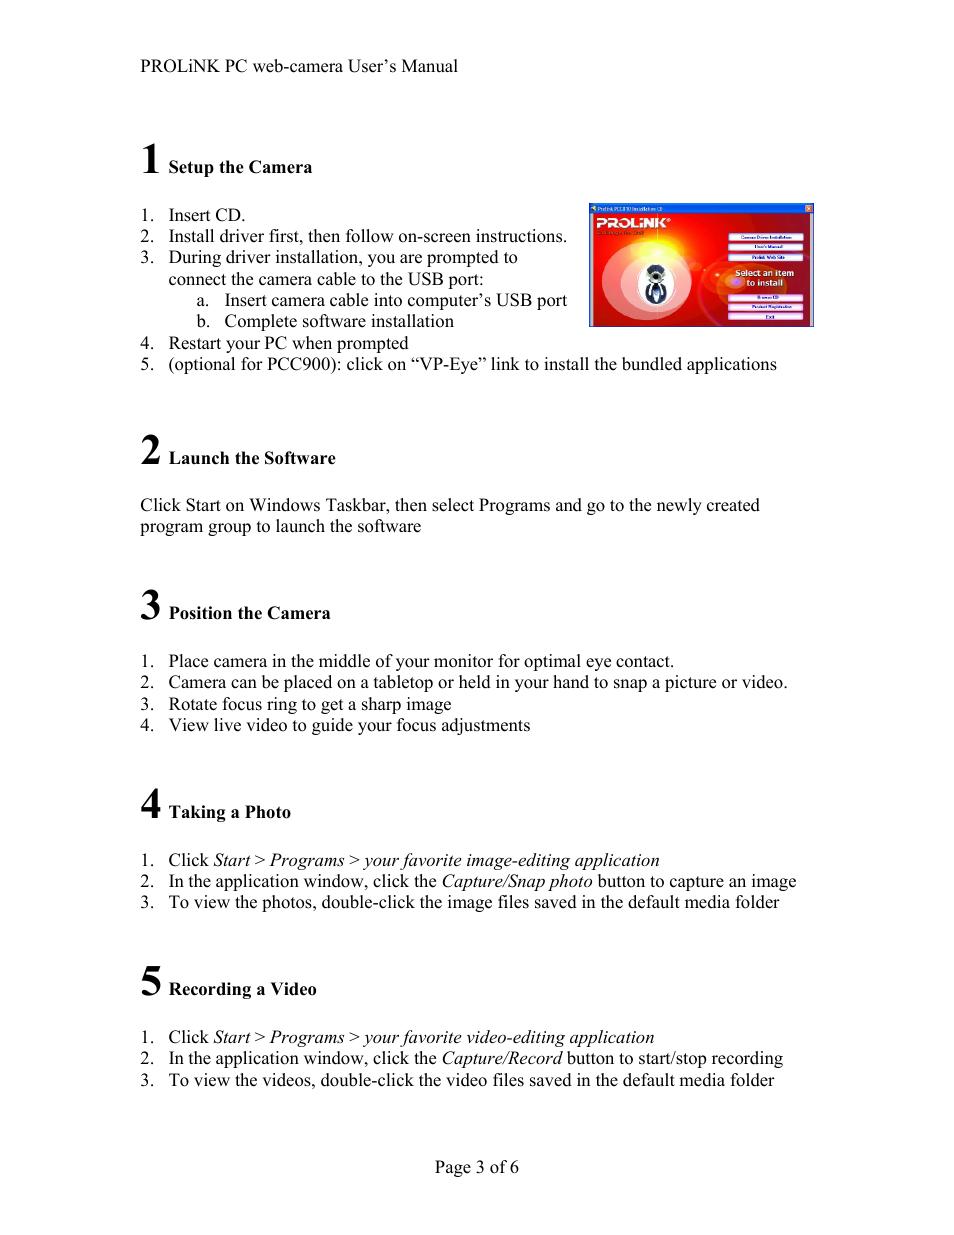 PROLiNK PCC900 PROLiNK PC camera User Manual | Page 3 / 6